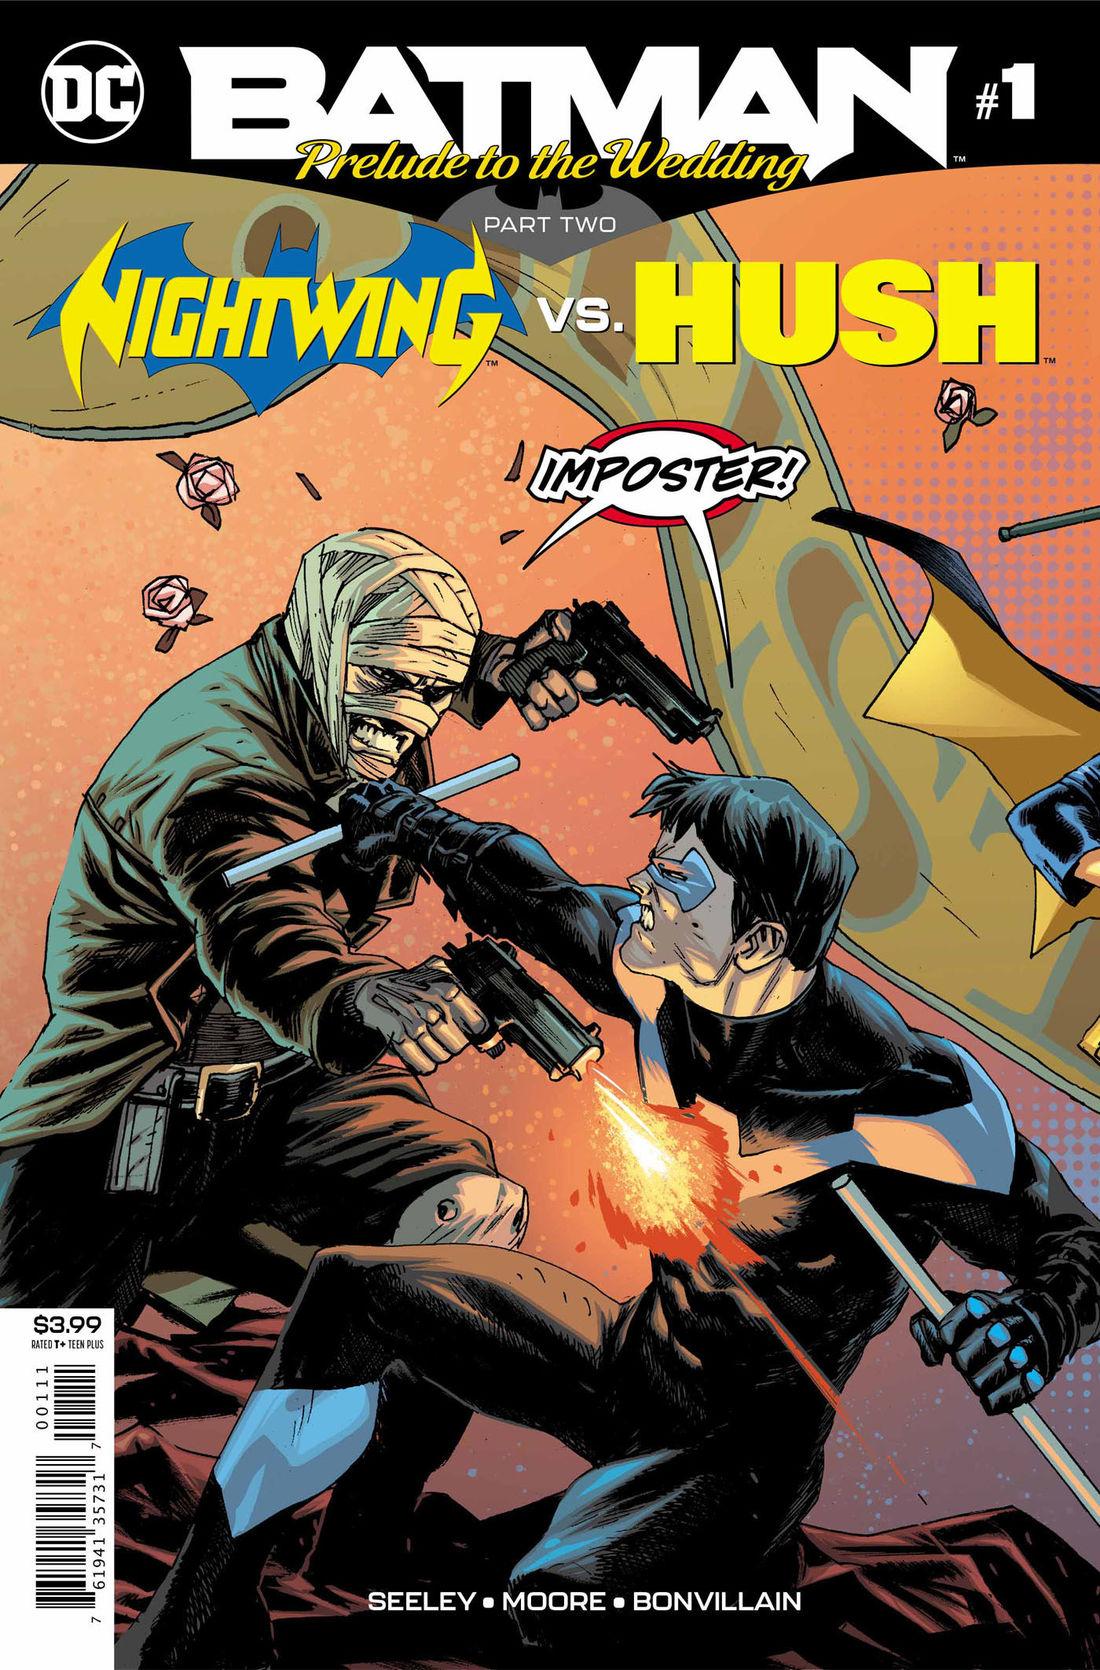 batman_prelude_to_the_wedding_nightwing_vs_hush_1_cover